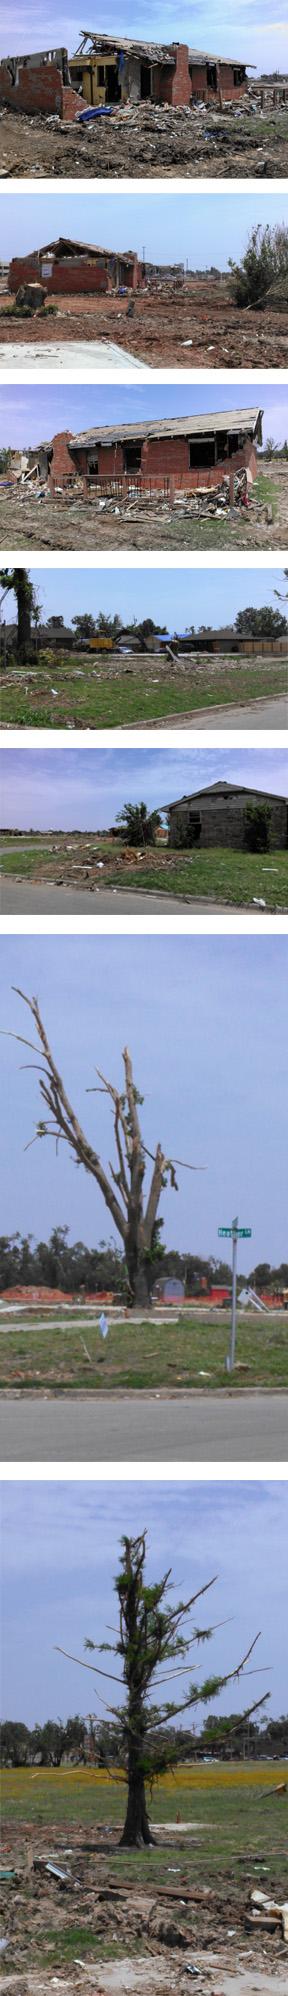 Moore Oklahoma Damage